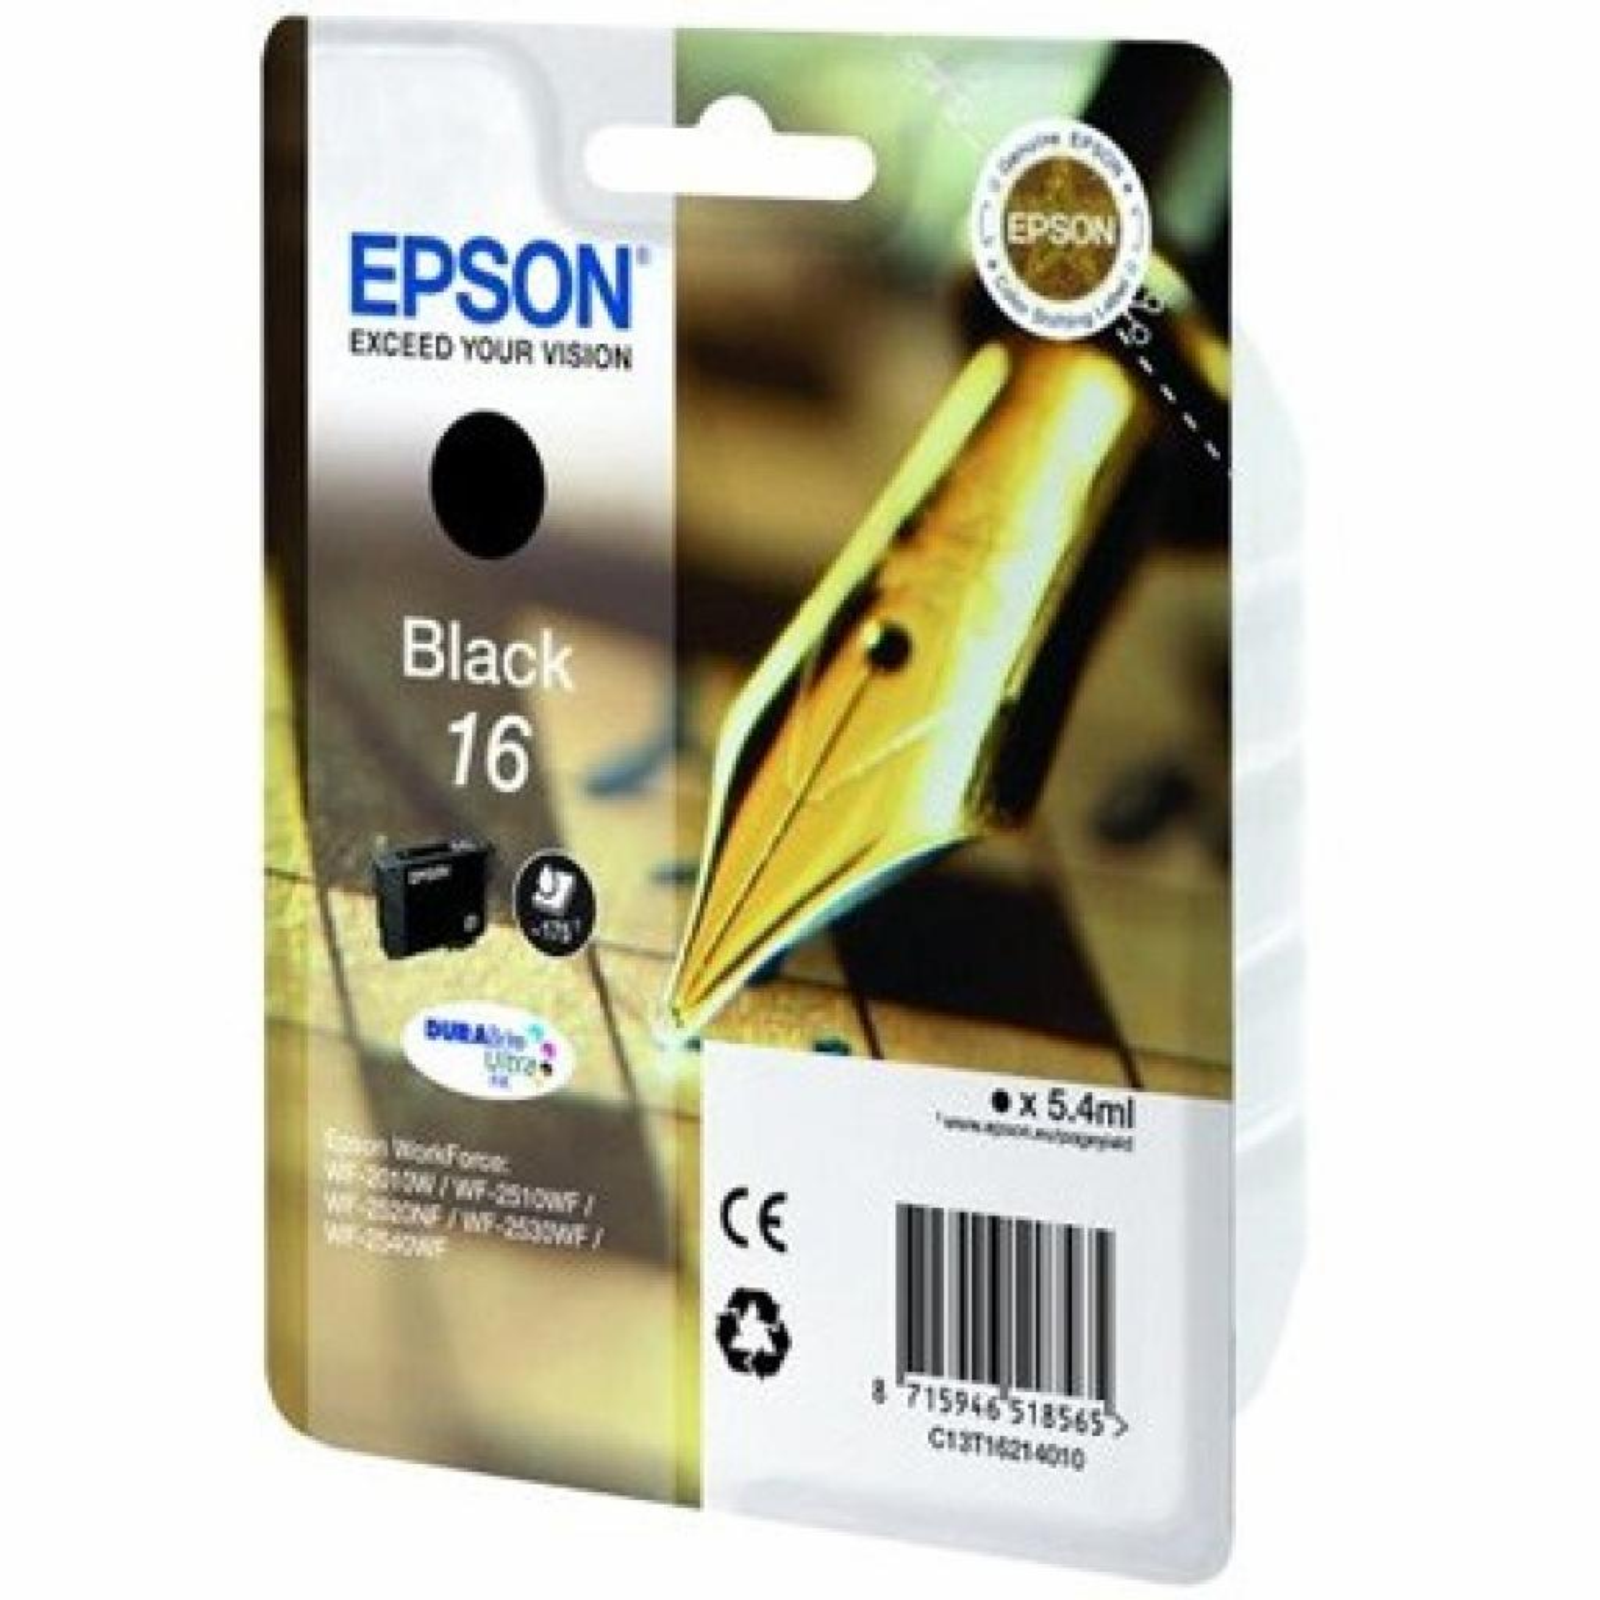 Картридж EPSON 16 WF-2010 black (C13T16214010)